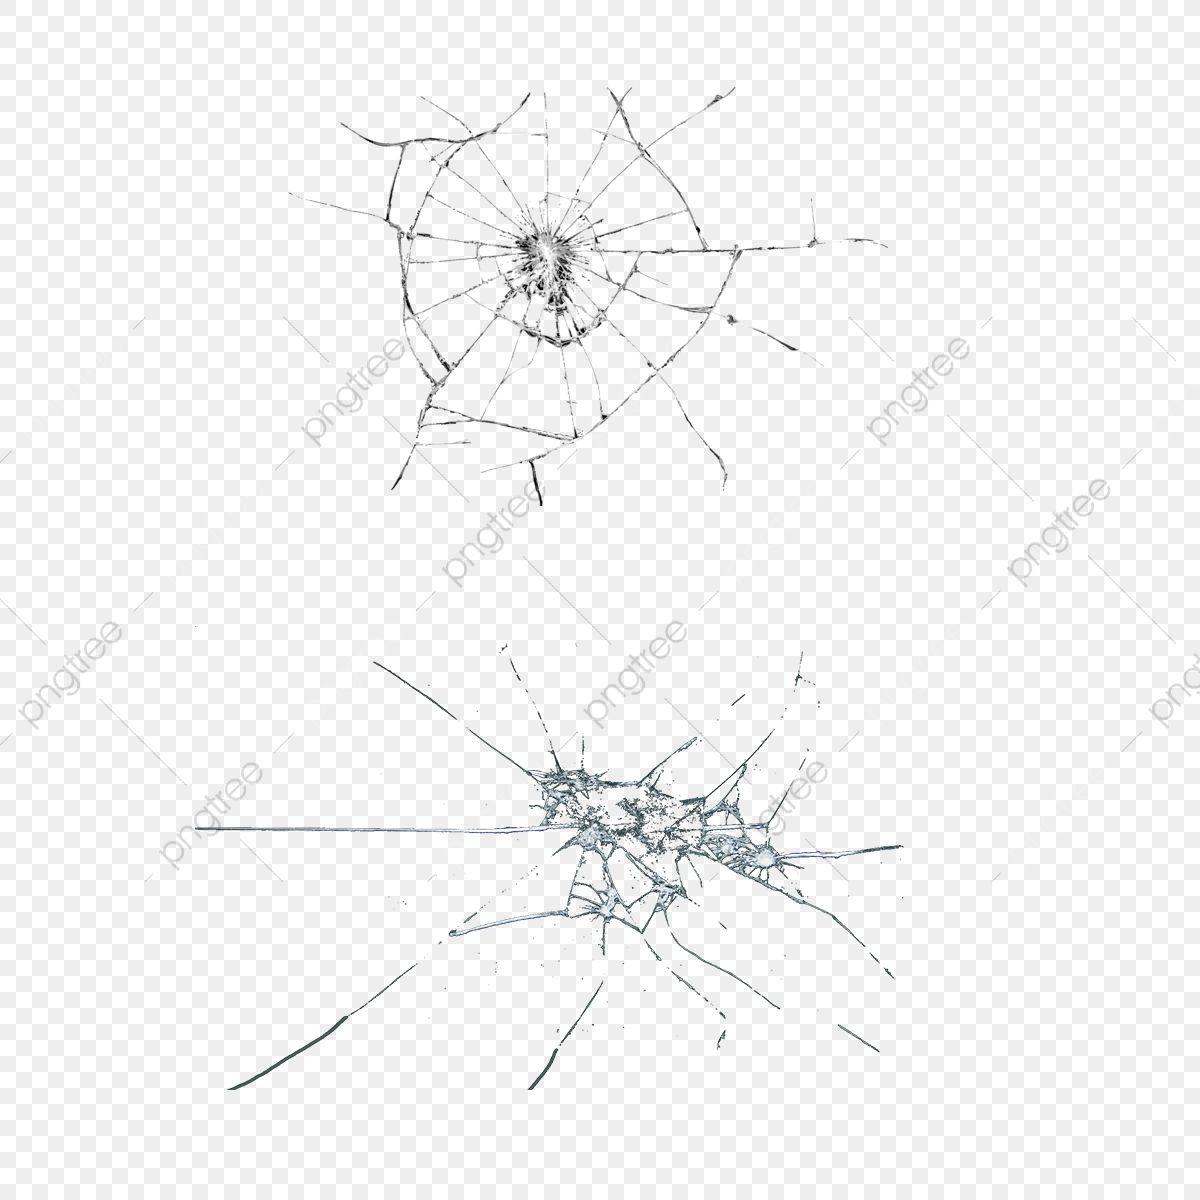 Broken Glass Broken Mirror Image Broken Glass Effect Png Transparent Clipart Image And Psd File For Free Download Broken Mirror Broken Glass Best Free Lightroom Presets